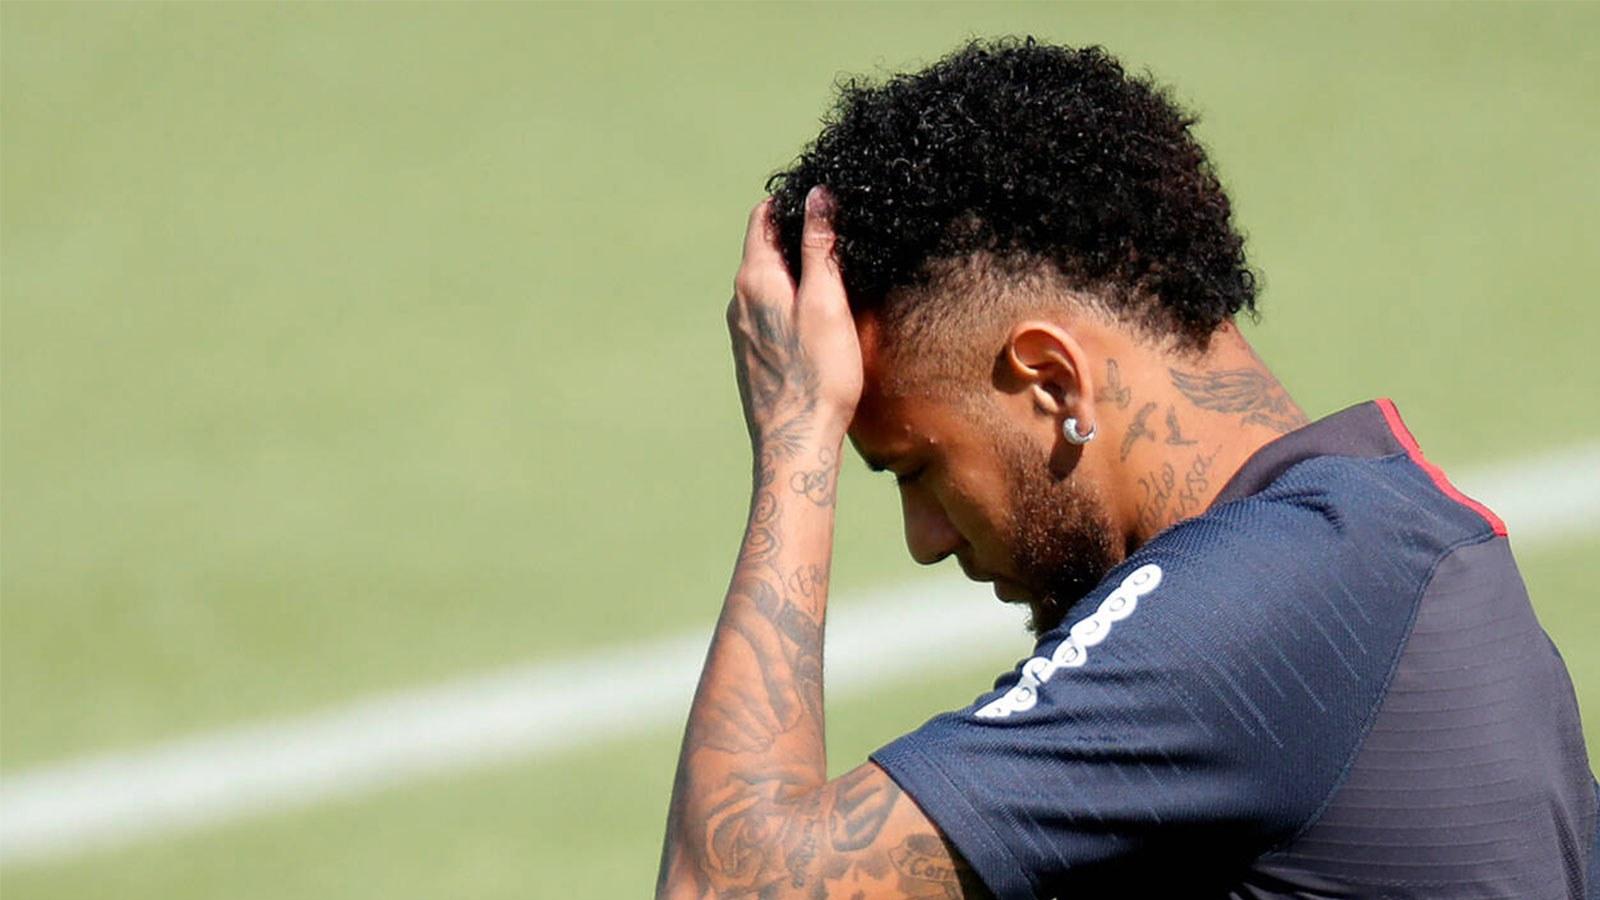 rémi gaillard essaie de conclure un deal avec neymar en